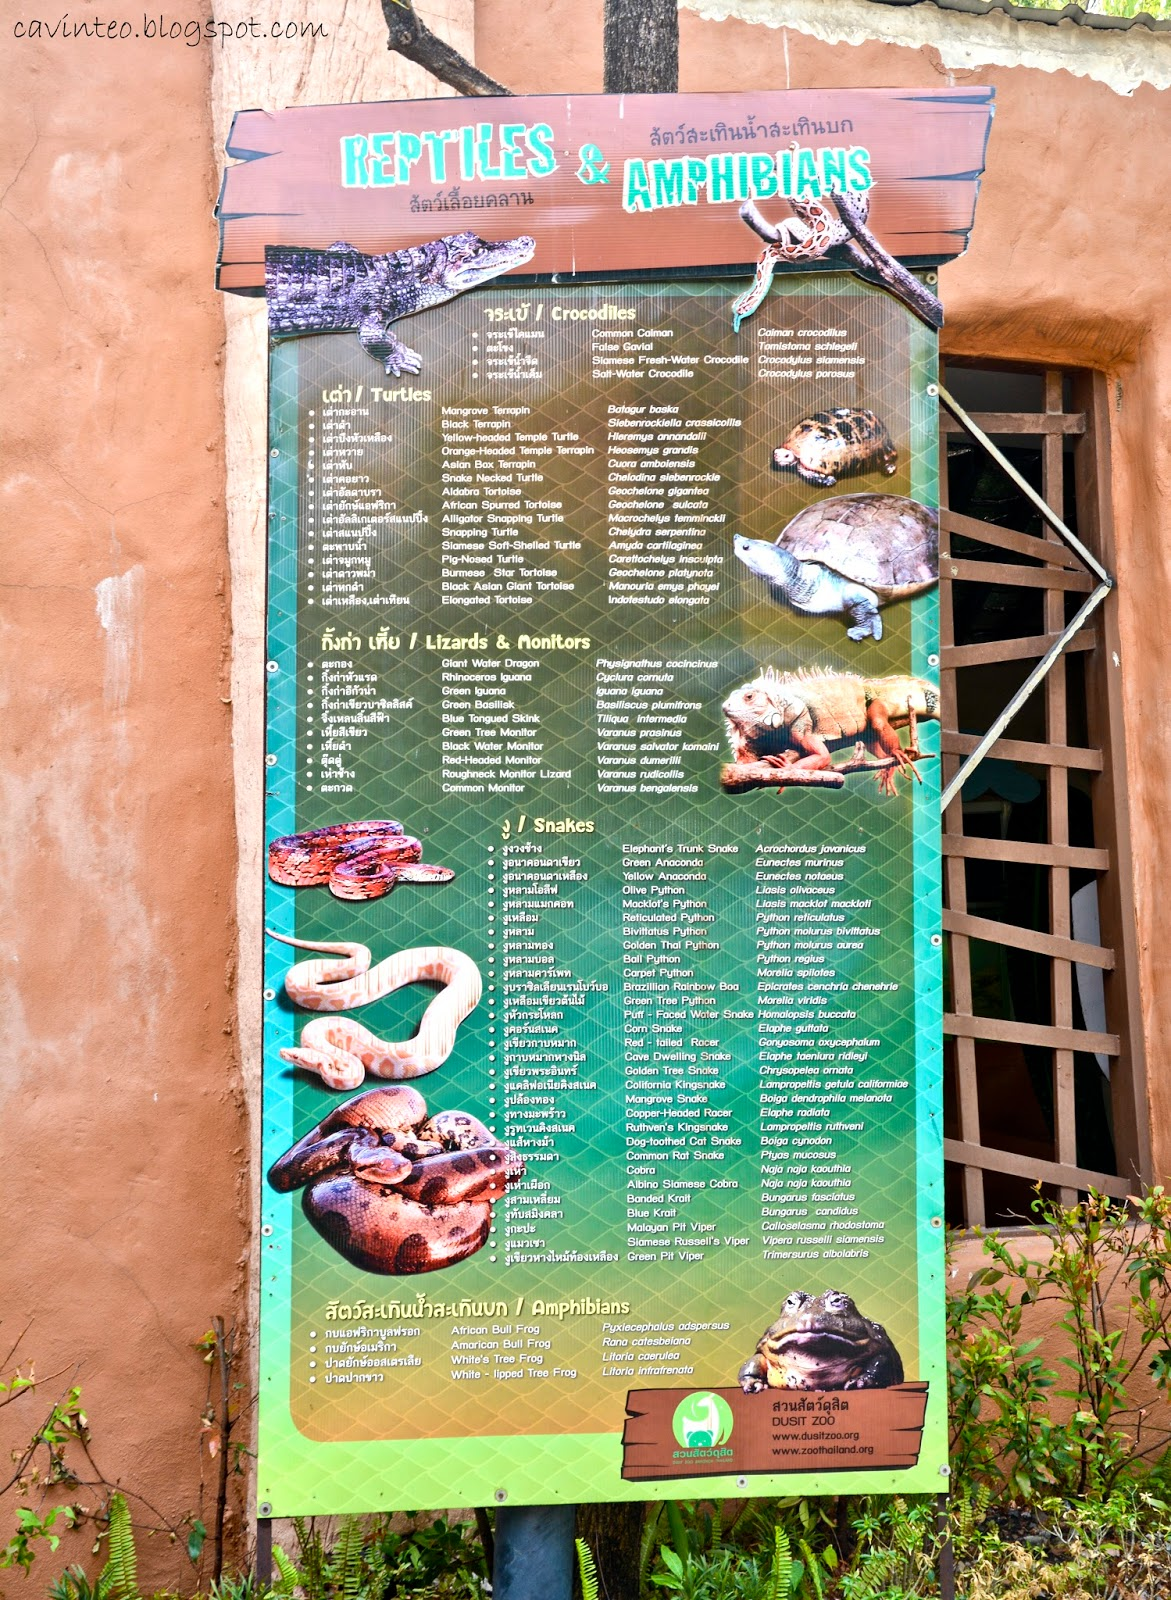 Entree Kibbles Reptile Terrarium House Dusit Zoo Bangkok